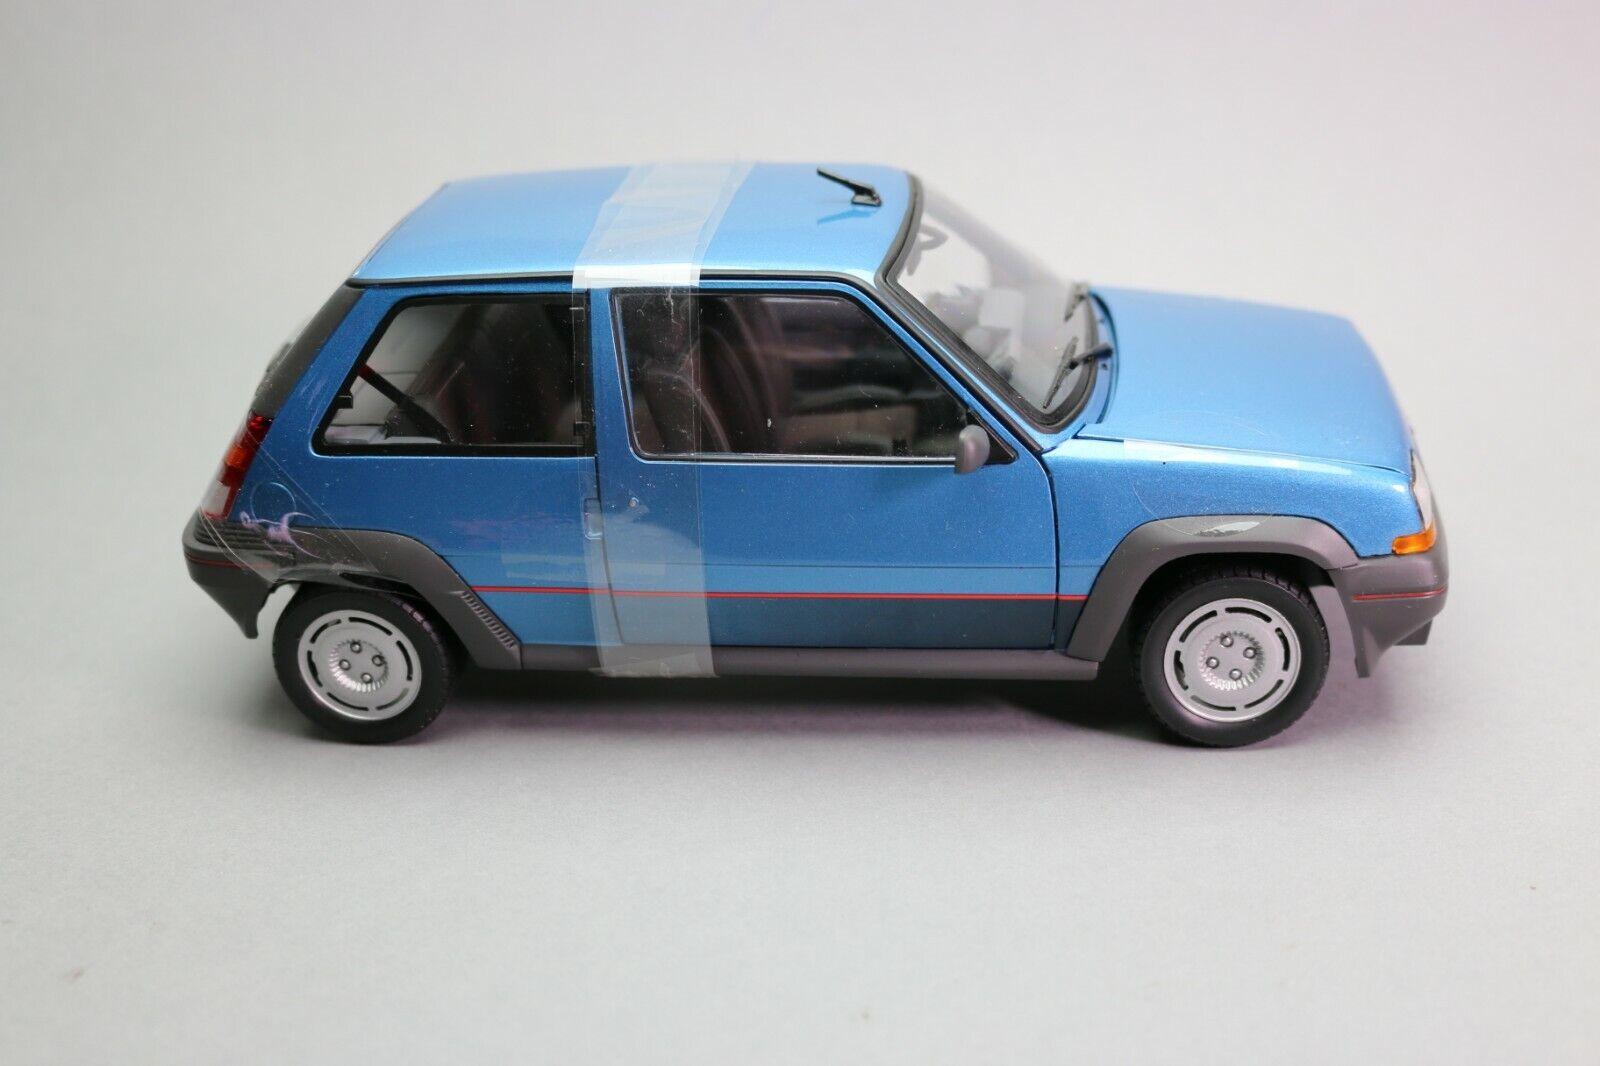 ZD096 NOREV 185207 Voiture 1 18 Renault Super cinq GT Turbo blue métal Edl